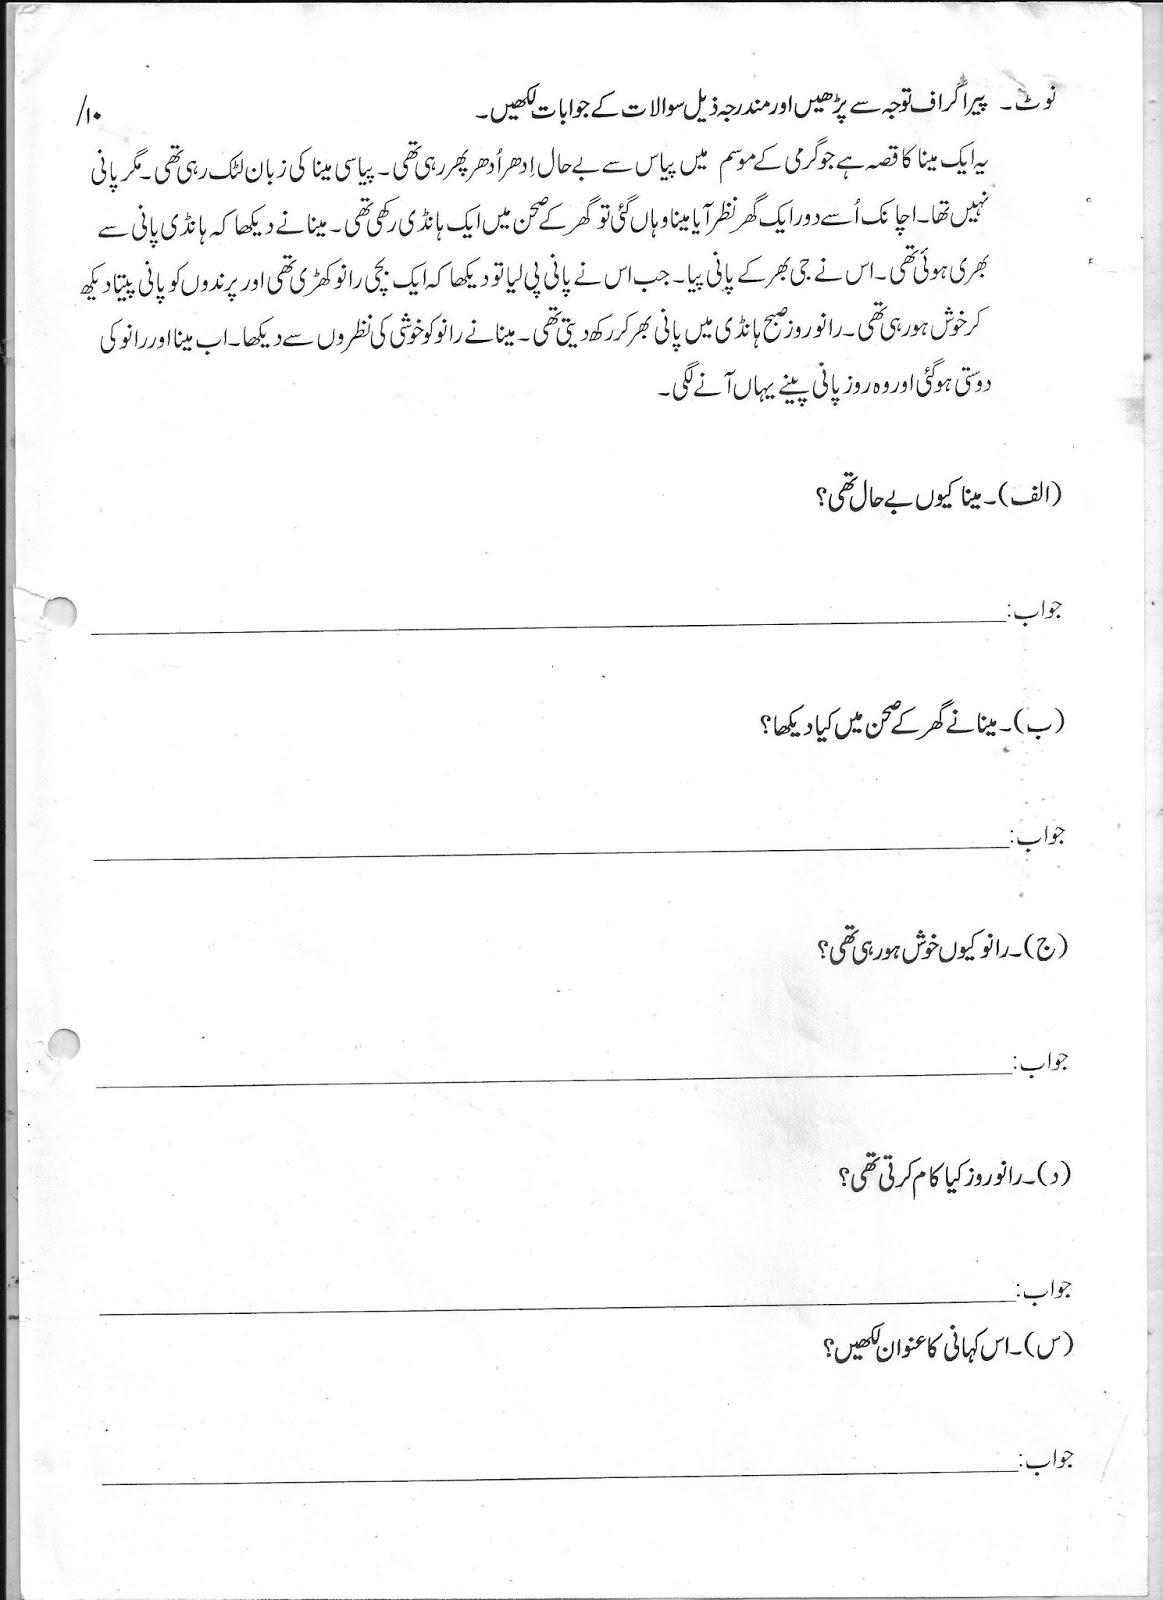 medium resolution of Urdu Worksheets For Grade 6   Printable Worksheets and Activities for  Teachers